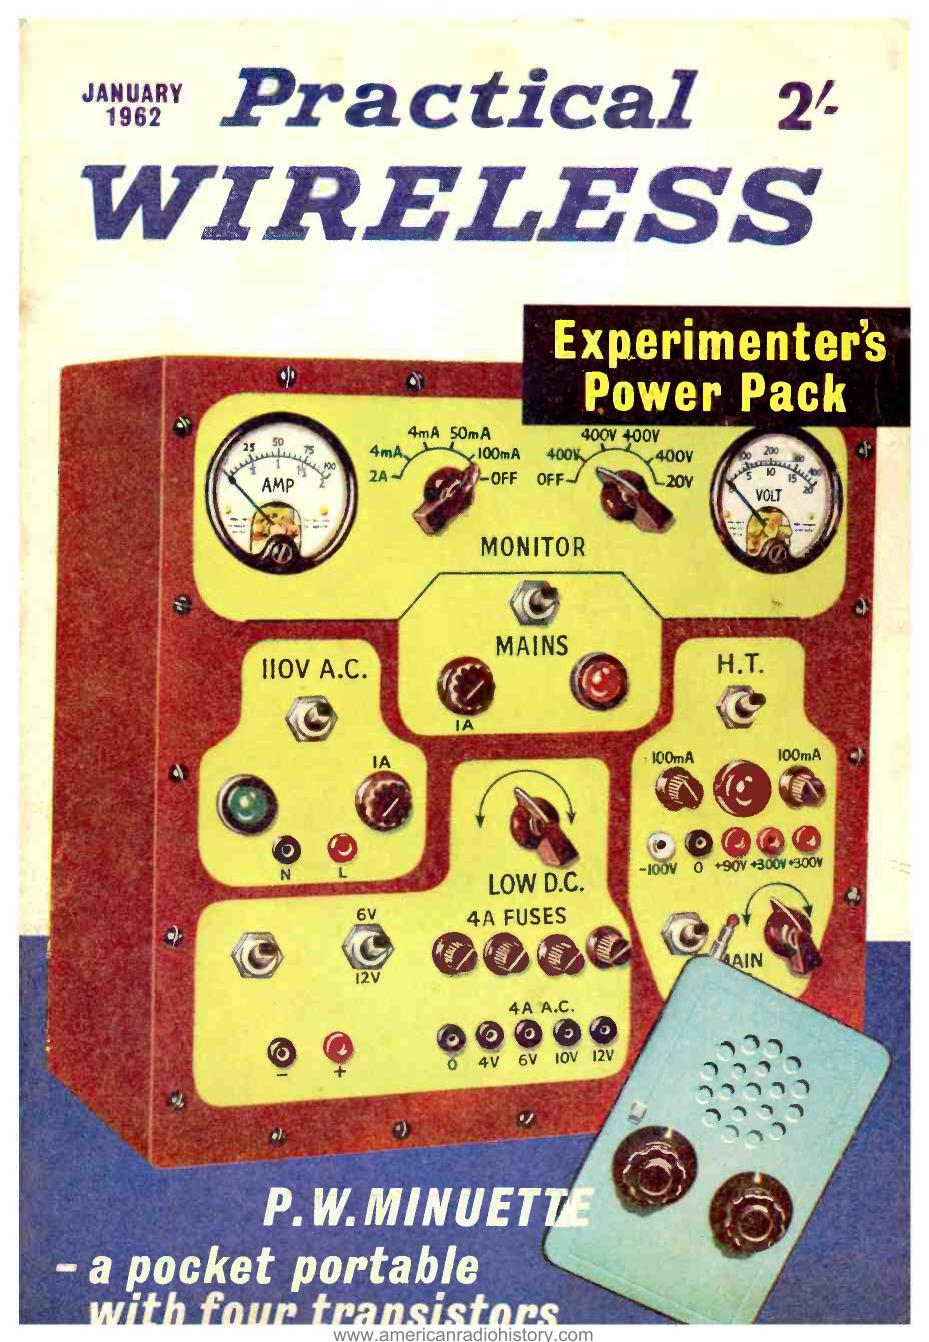 practical 24 - American Radio History | manualzz com